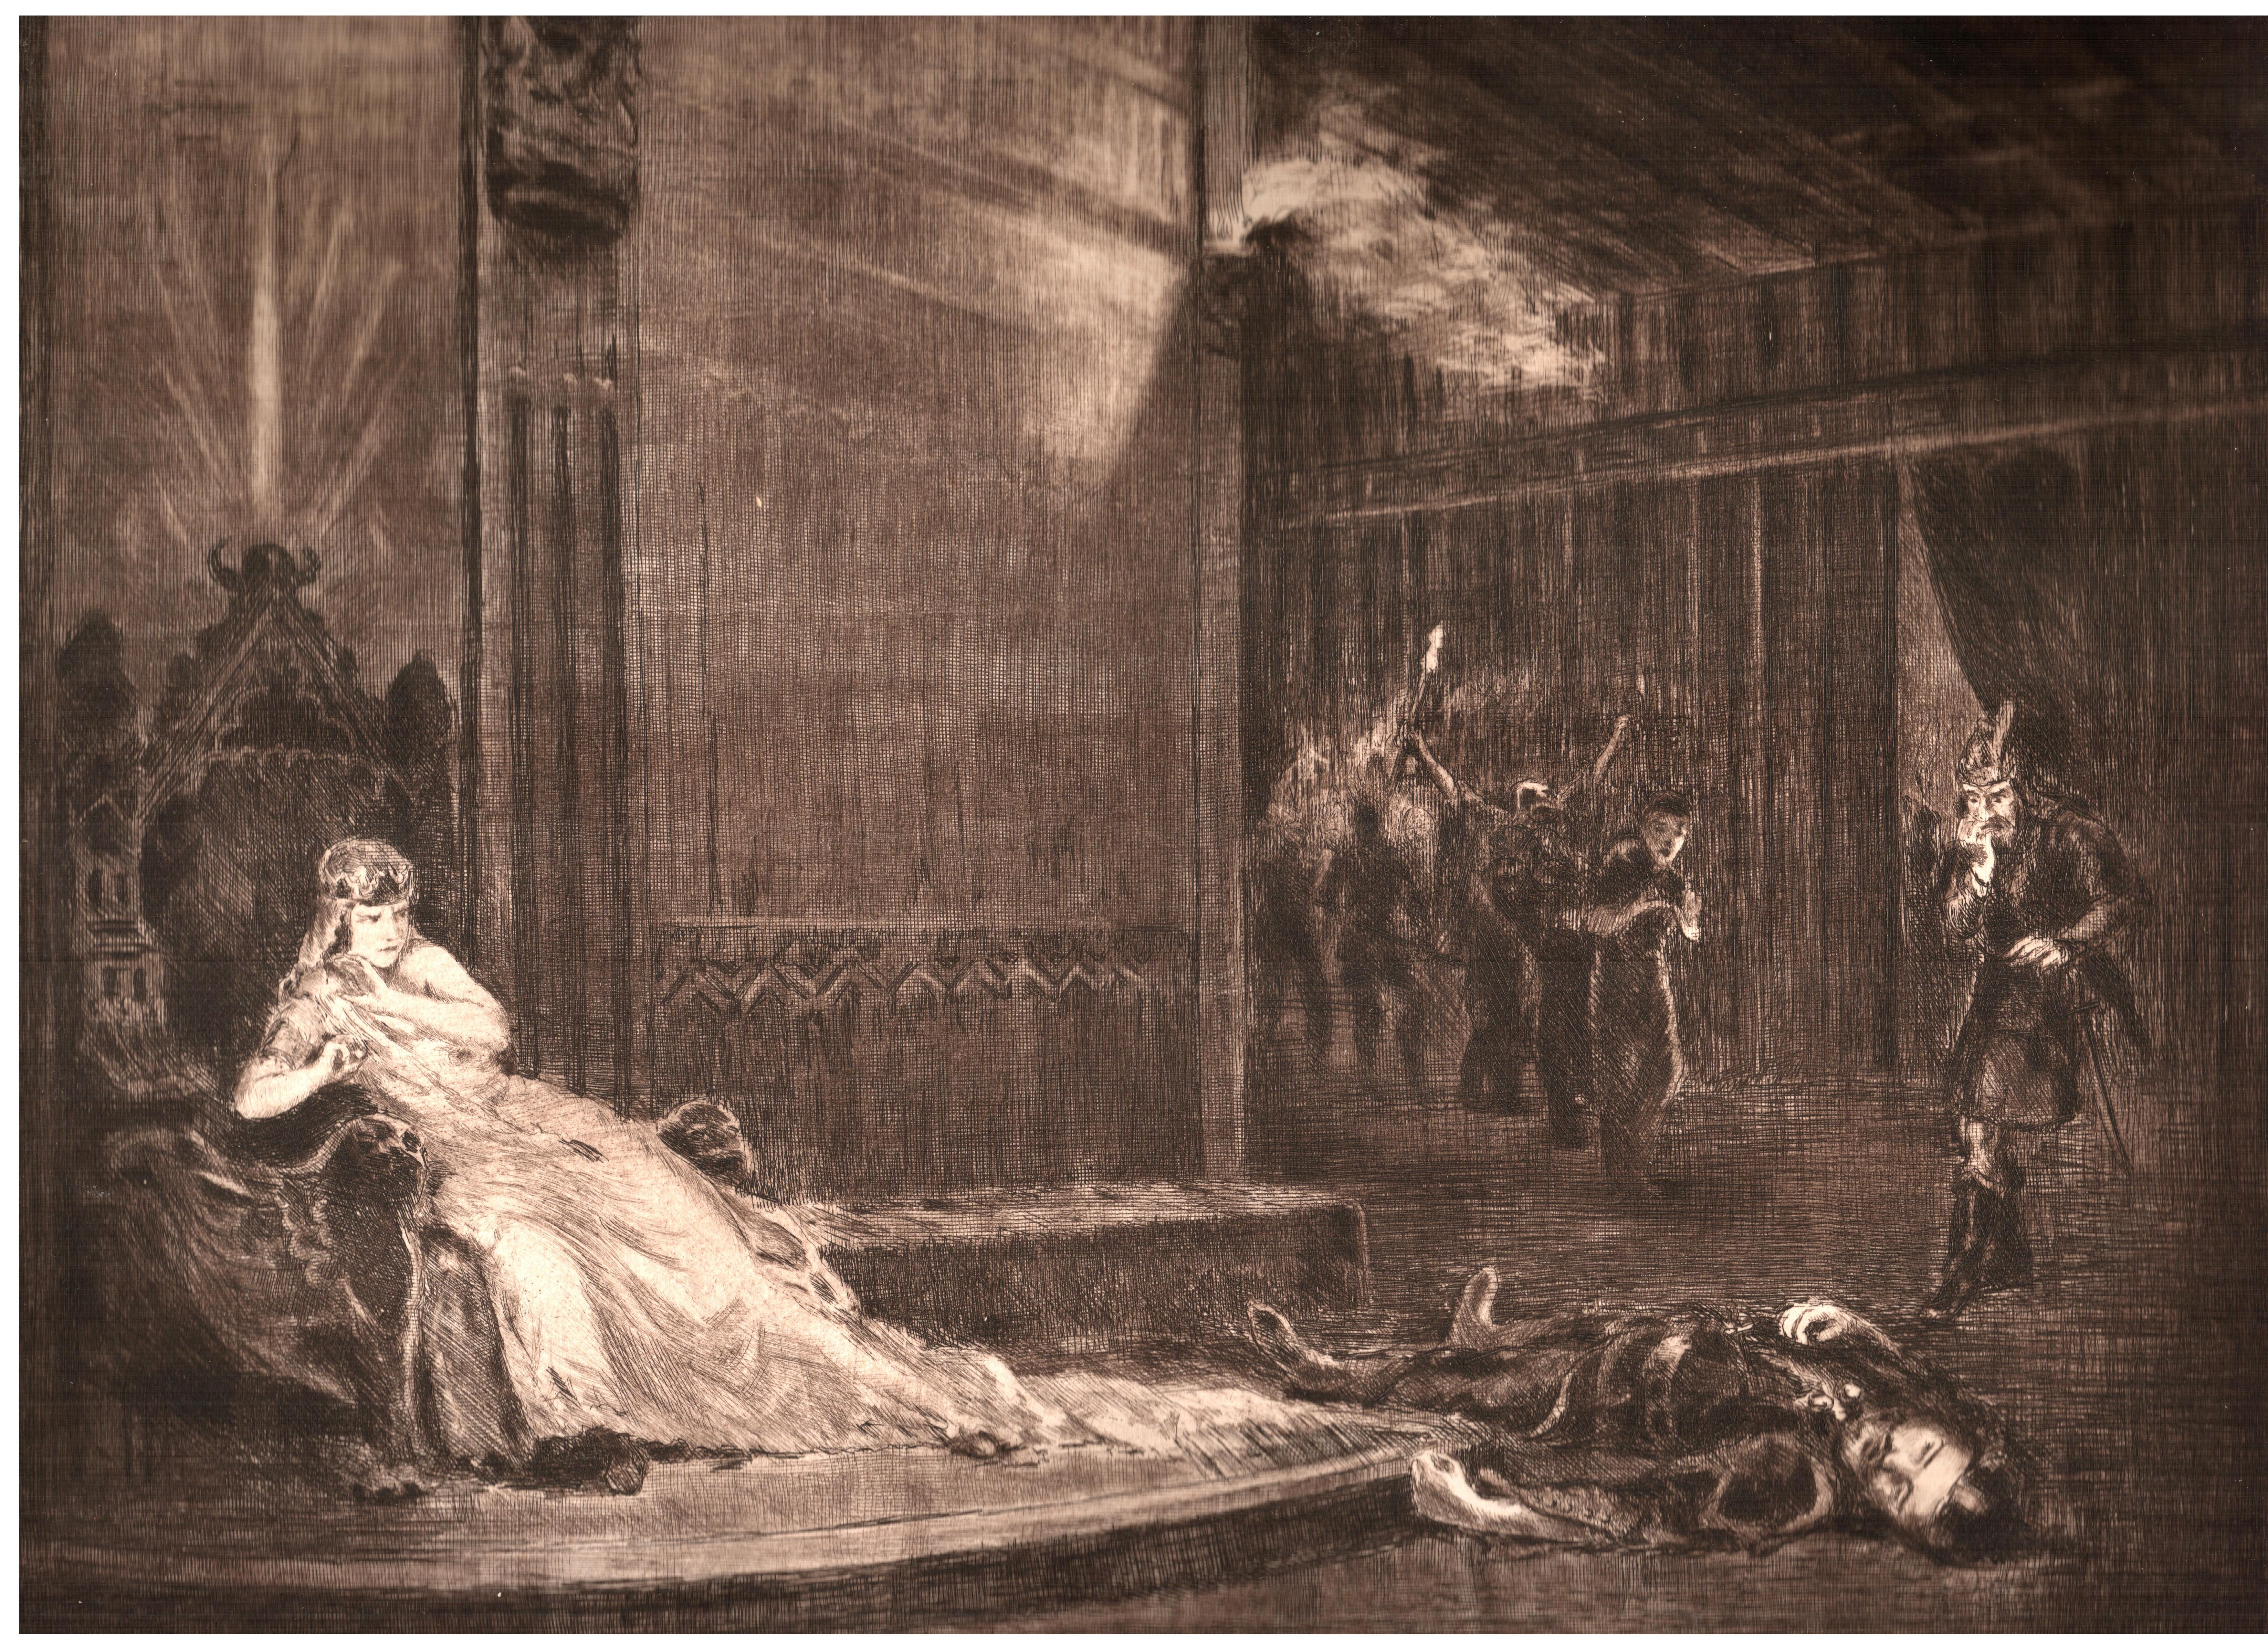 FileGreat King Attila murdered   15.jpg   Wikimedia Commons